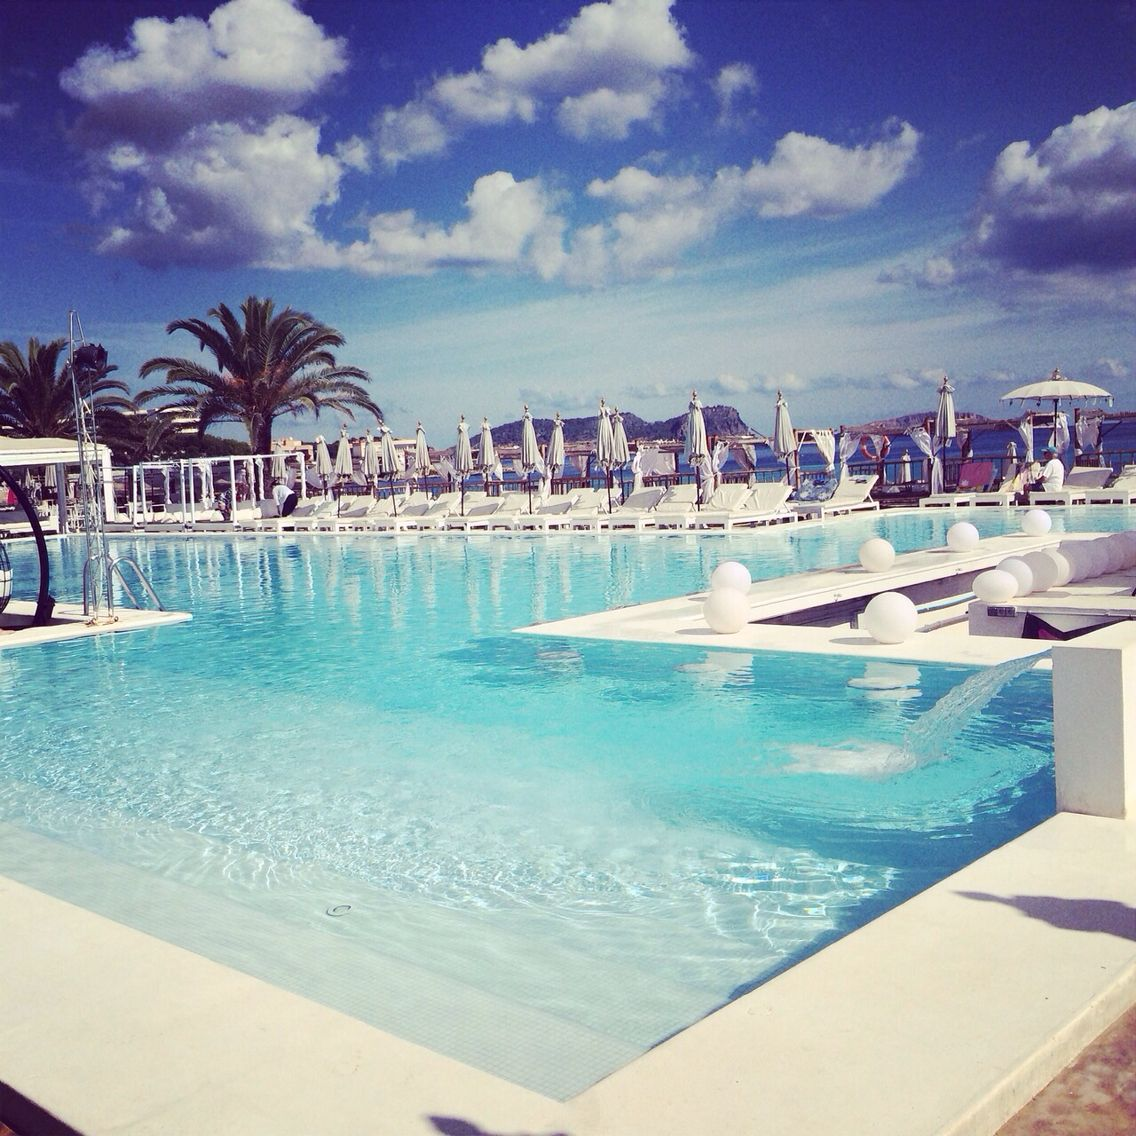 Long Stay Vacations In Spain: Jacaranda Beach Bar In Es Cana #Ibiza